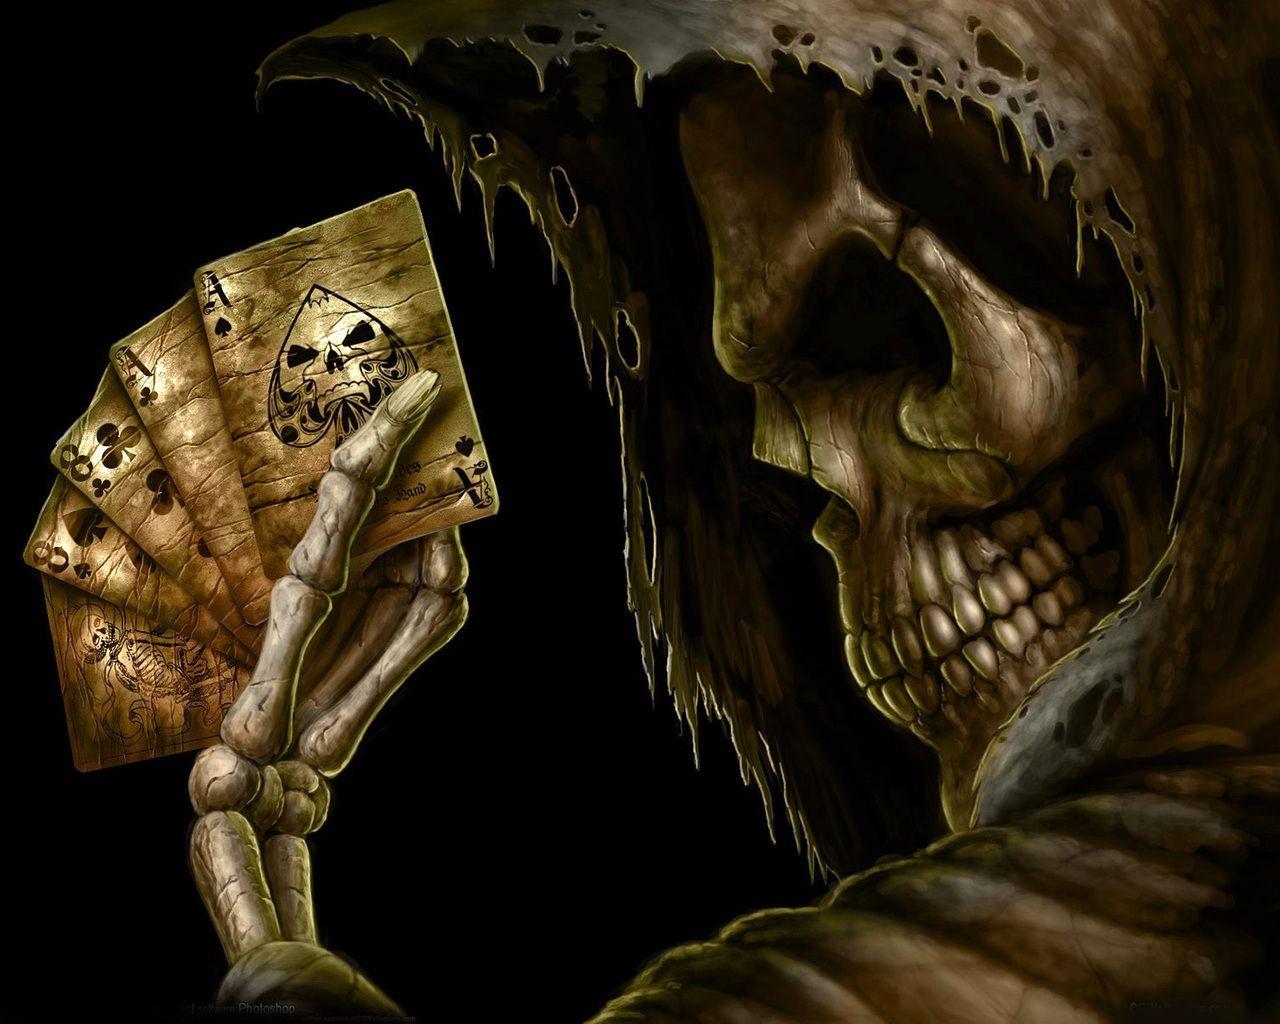 hd wallpapers | all wallpapers | pinterest | skeletons, skull